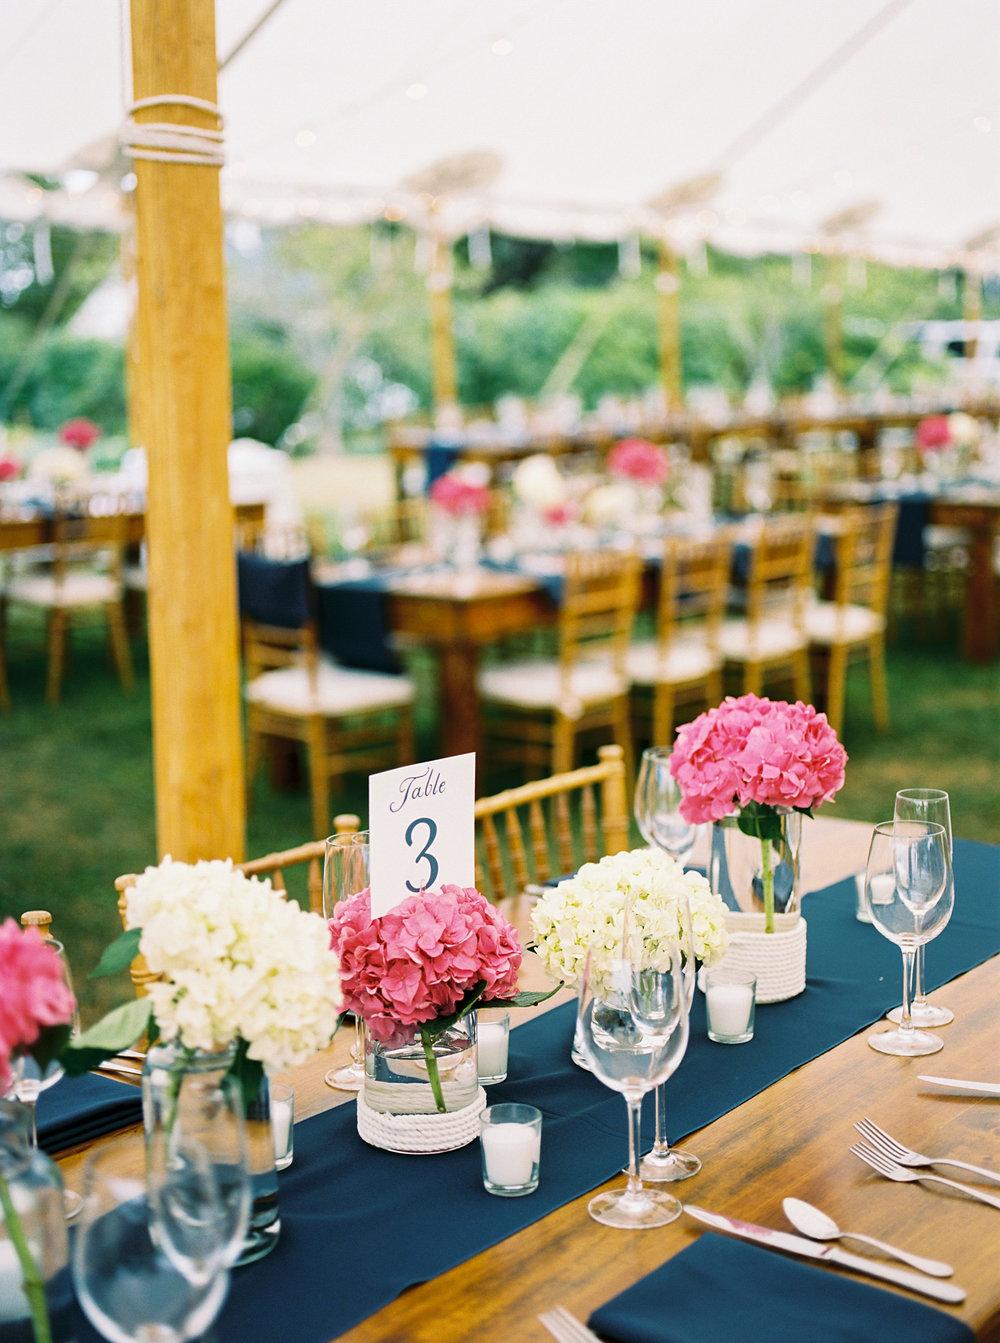 Alexandra-Elise-Photography-Ali-Reed-Chebeague-Island-Maine-Film-Wedding-Photographer-Elizabeth-Josh-Wedding-Reception-032.jpg